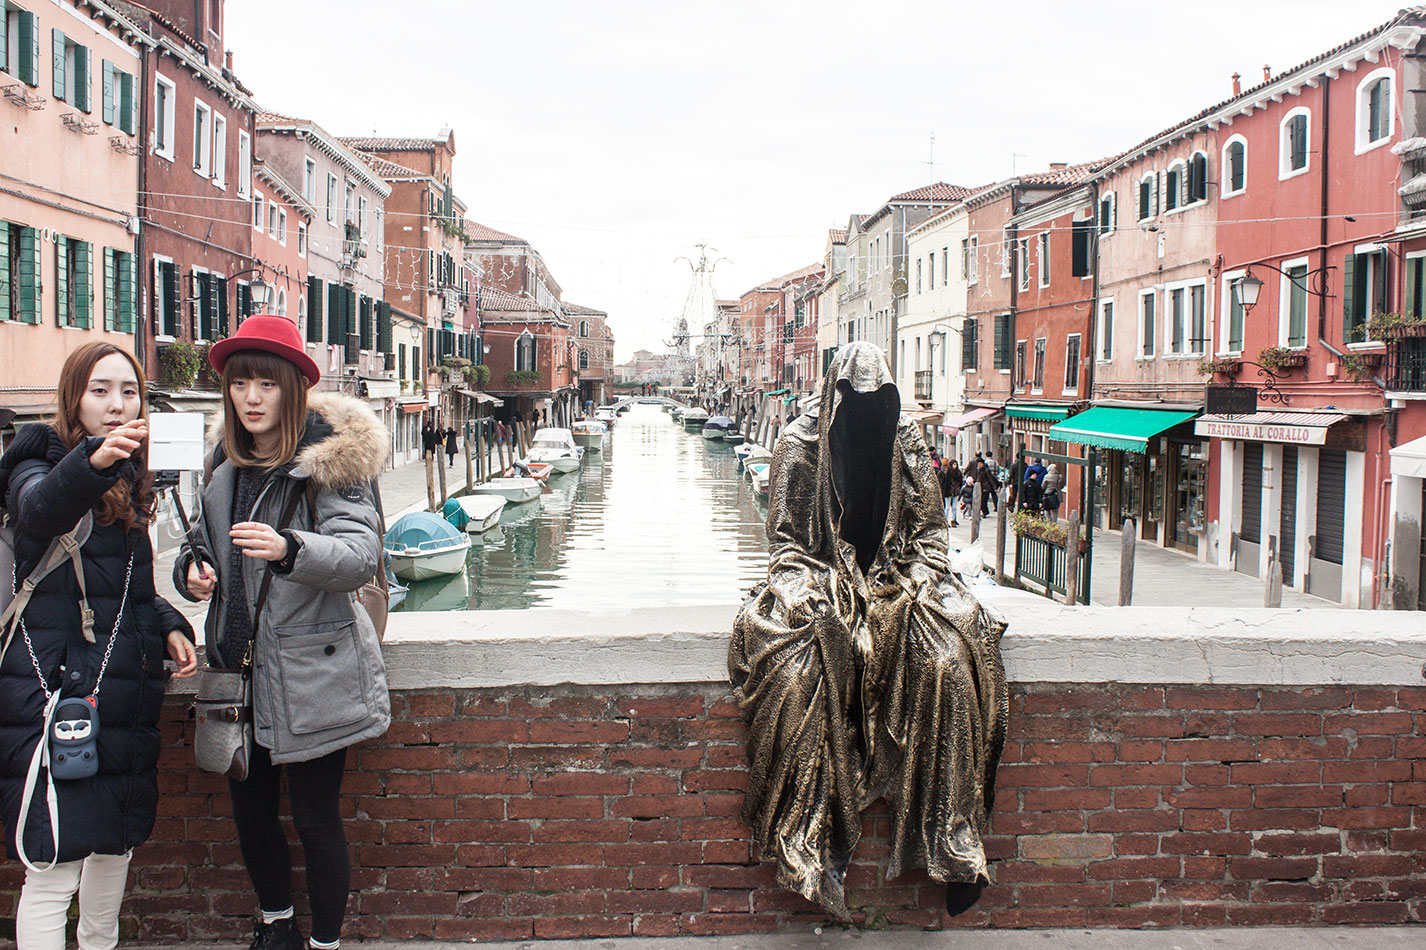 Italia-Venice-Murano-Berengo-glas-studio-glasstress-guardians-of-time-by-Manfred-Kili-Kielnhofer-contemporary-art-design-show-7155